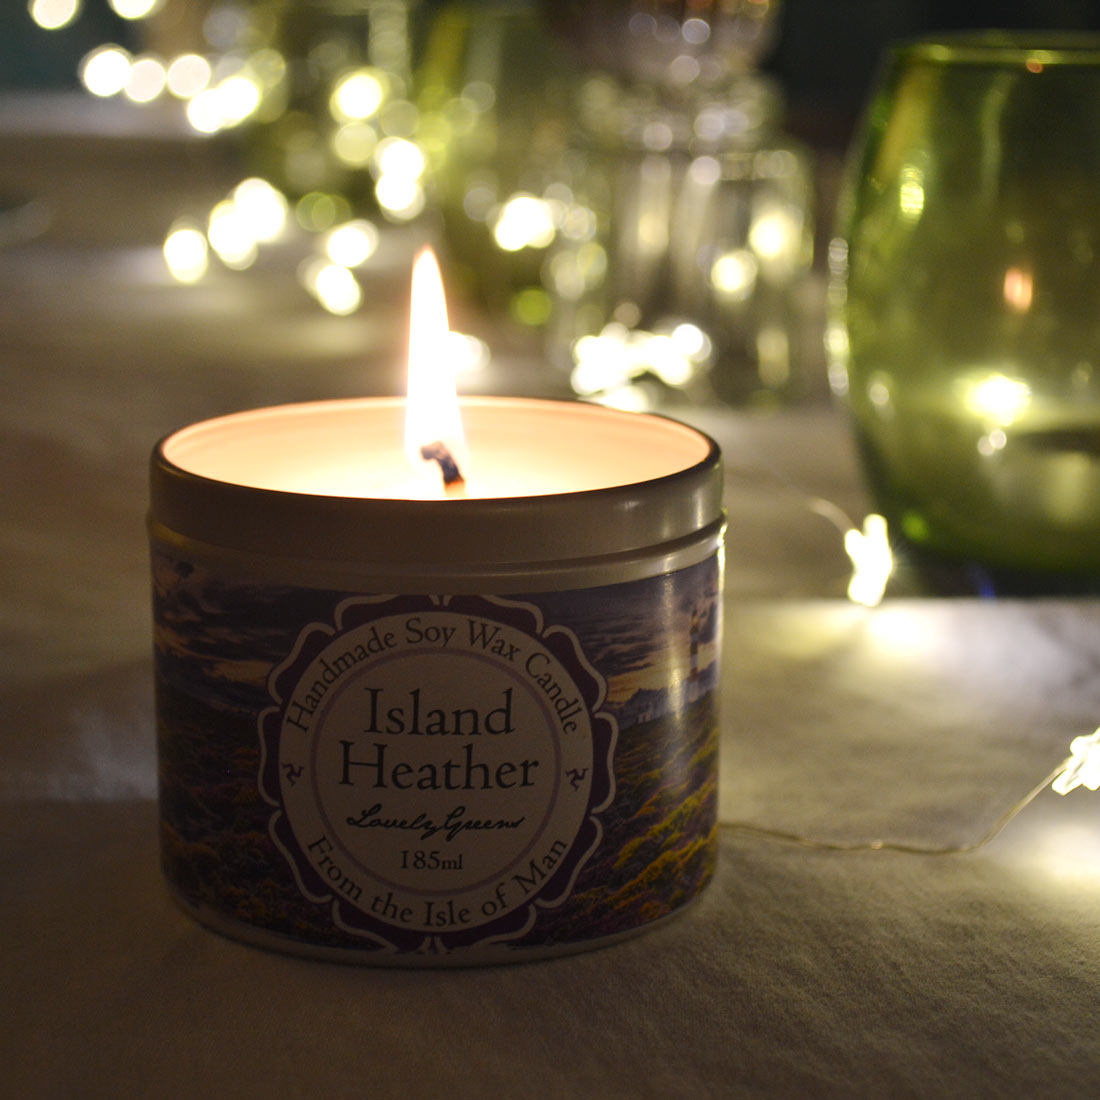 Island Heather Candle | Lovely Greens Handmade